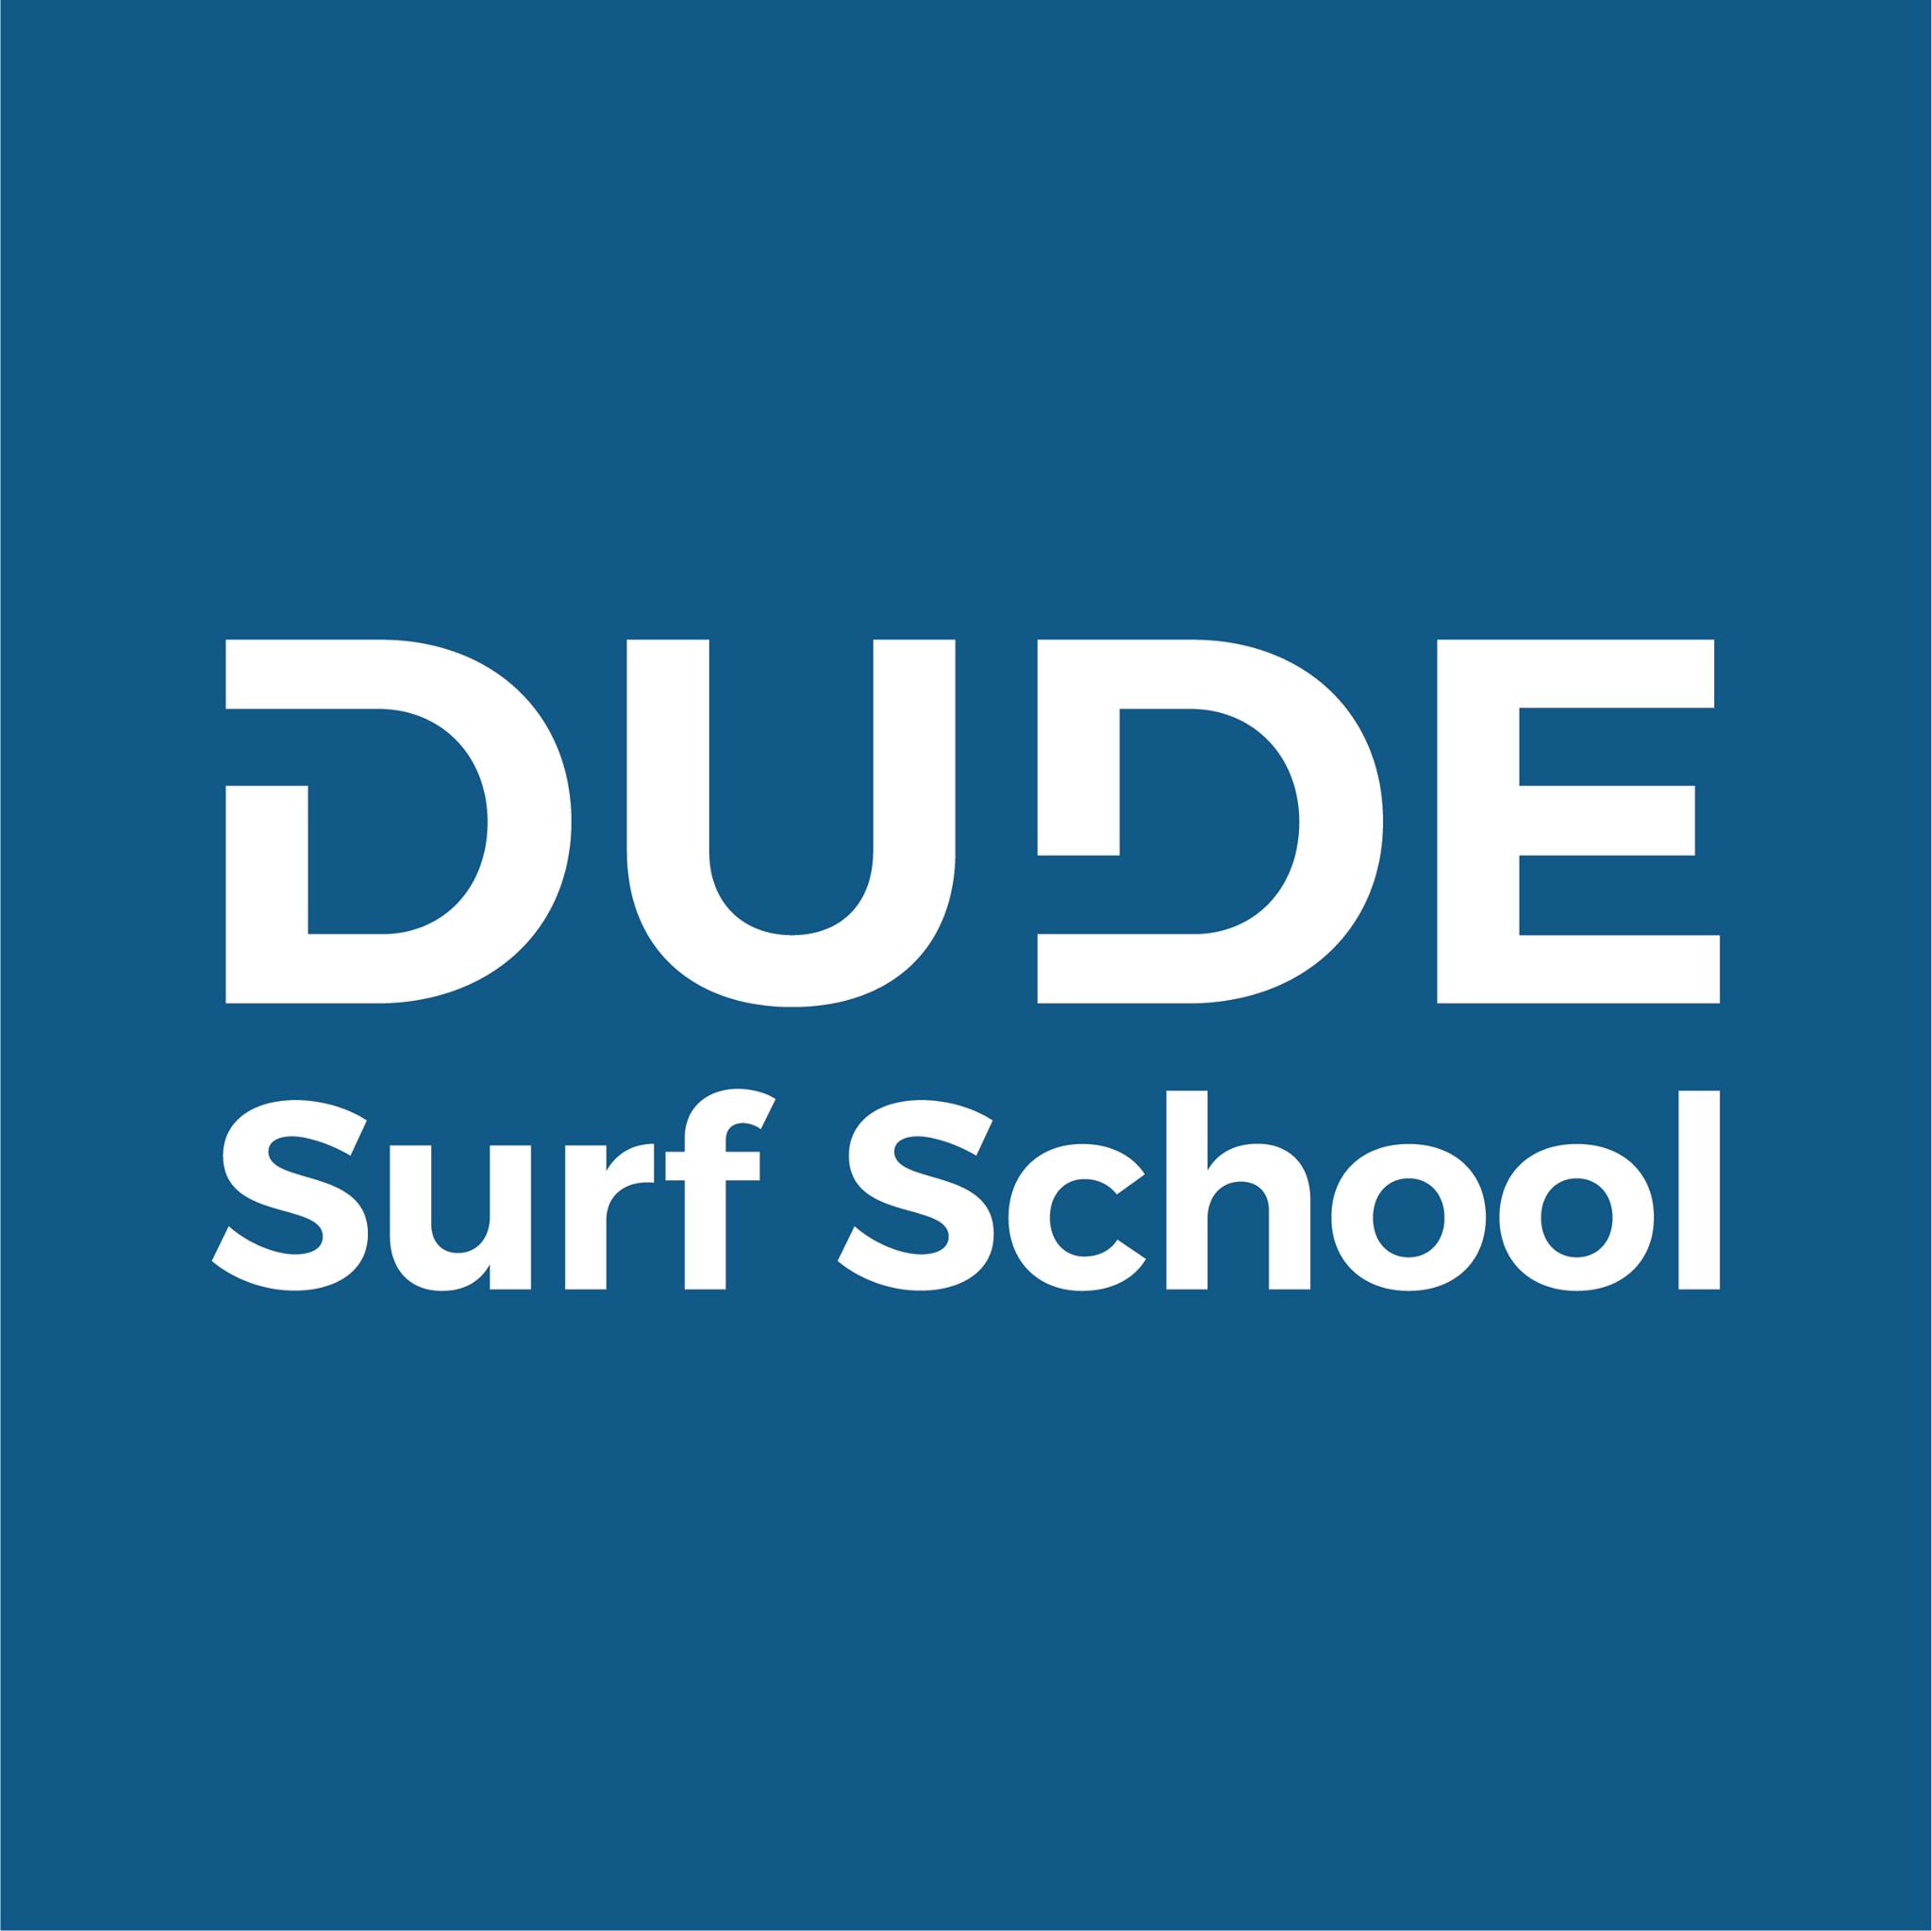 Surfcamp Dude Surf School in Figueira da Foz, Coimbra, Portugal